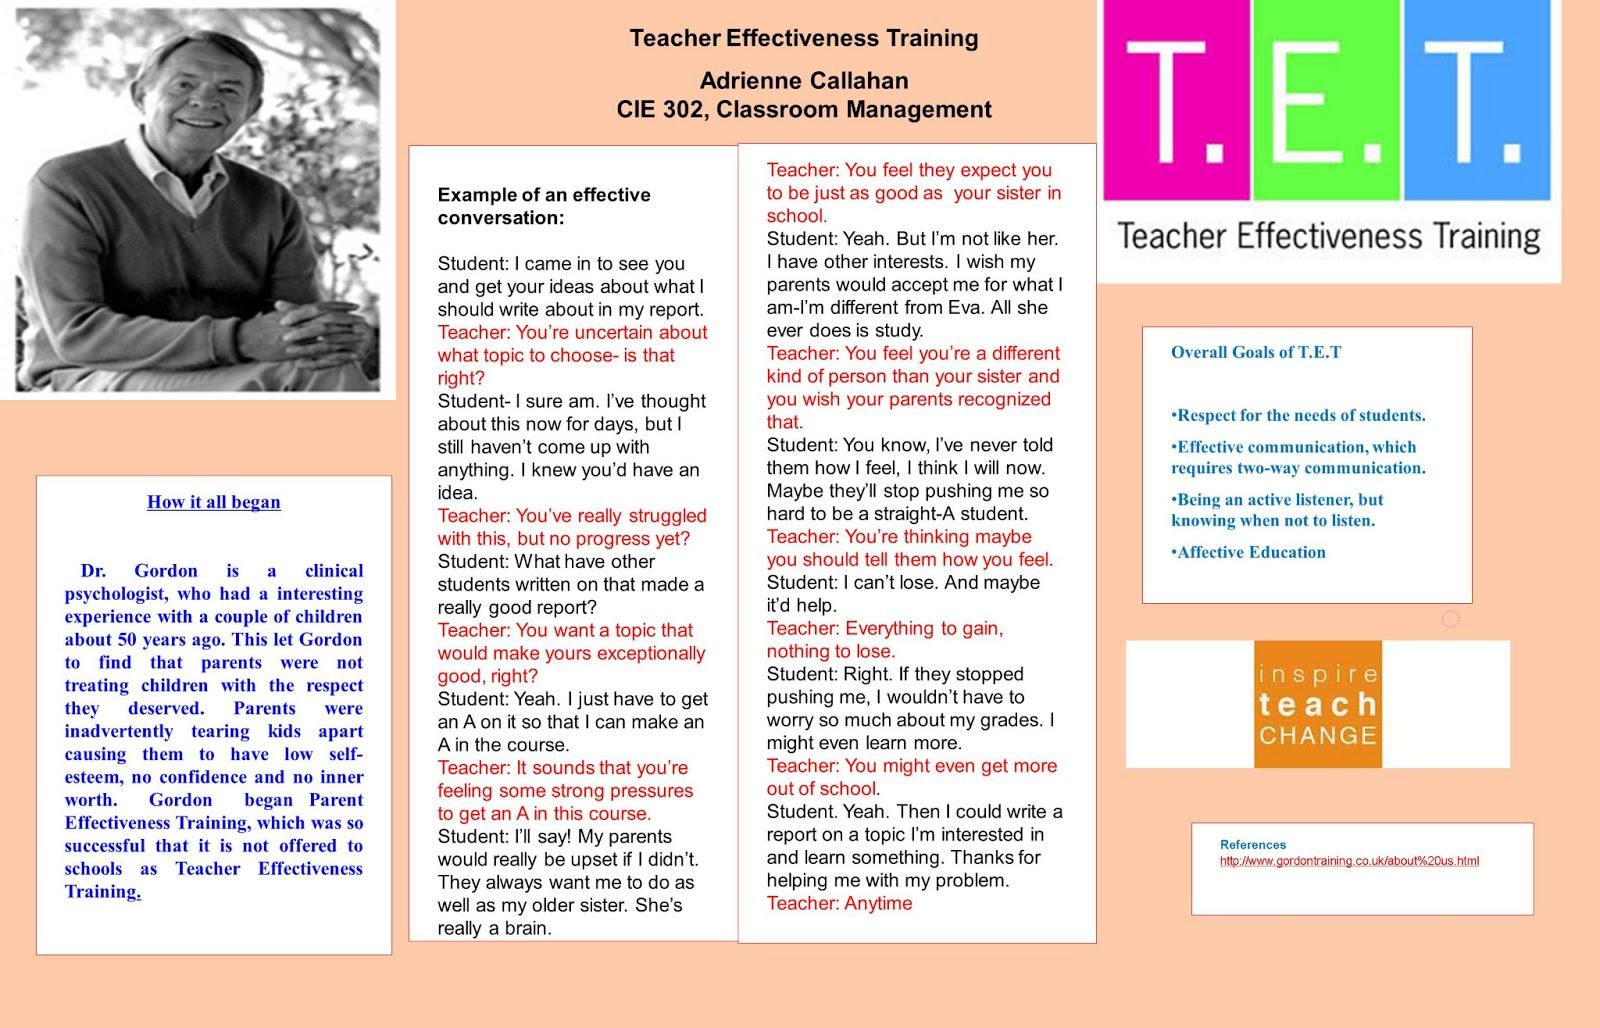 CIE 302 Theorist Model Posters Teacher Effectiveness Training